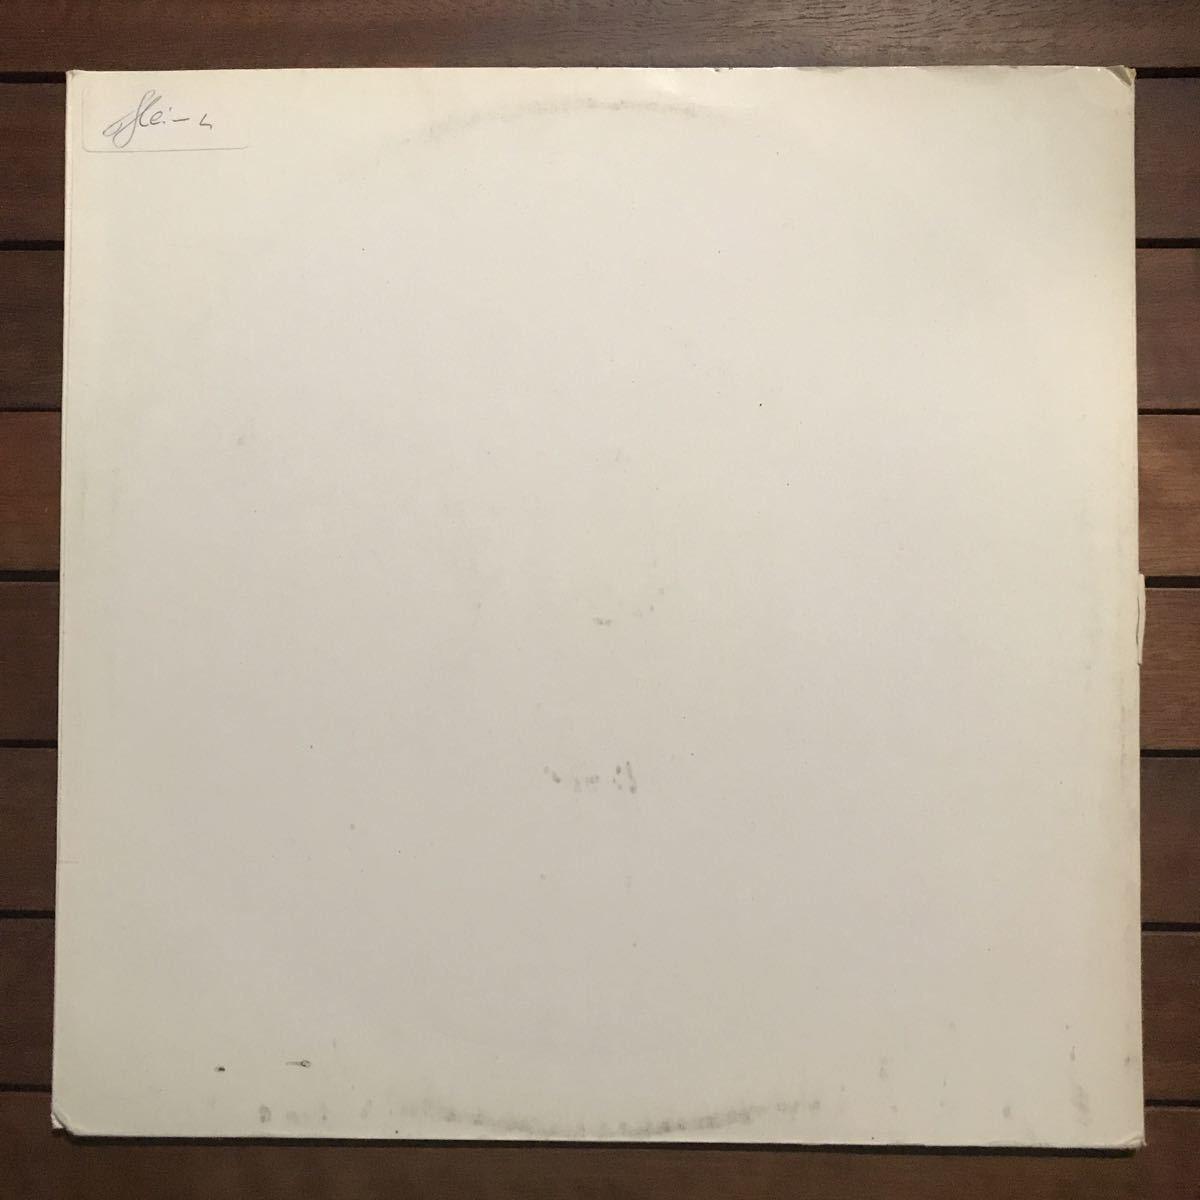 【eu-rap】Twendy Fo / Jump Like A Pump Action[12inch]オリジナル盤《3-2-71》